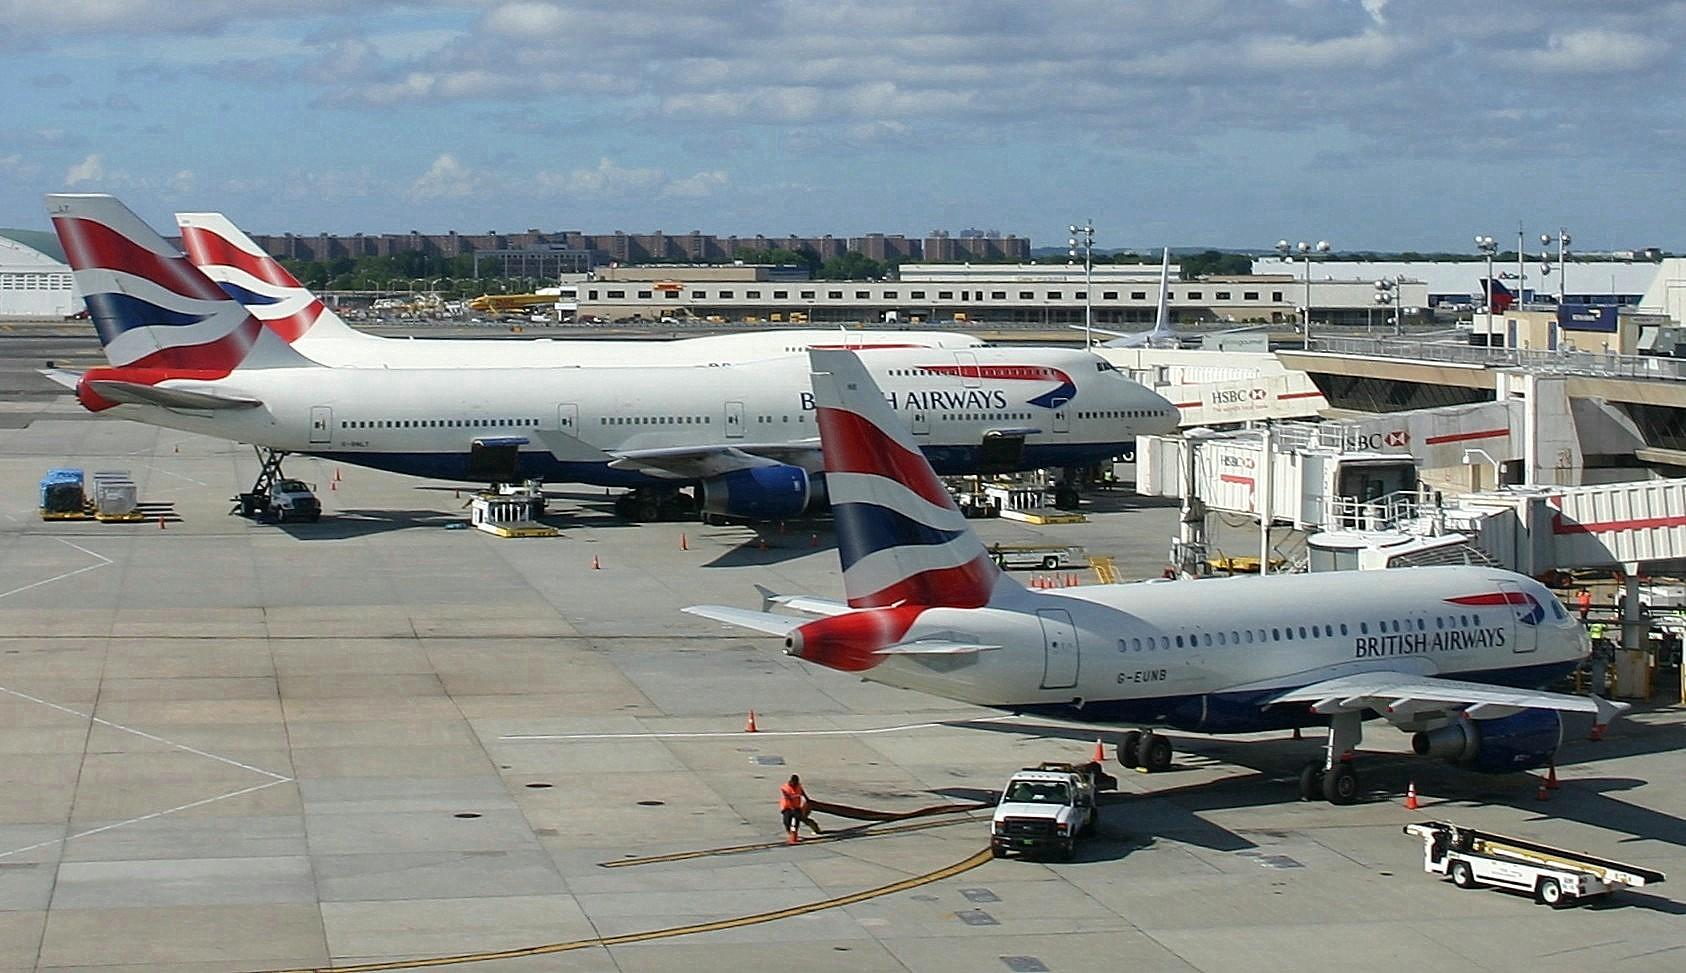 Airbus_A318_of_British_Airways_at_J.F.K._International_Airport_New_York_%28USA%29.jpg